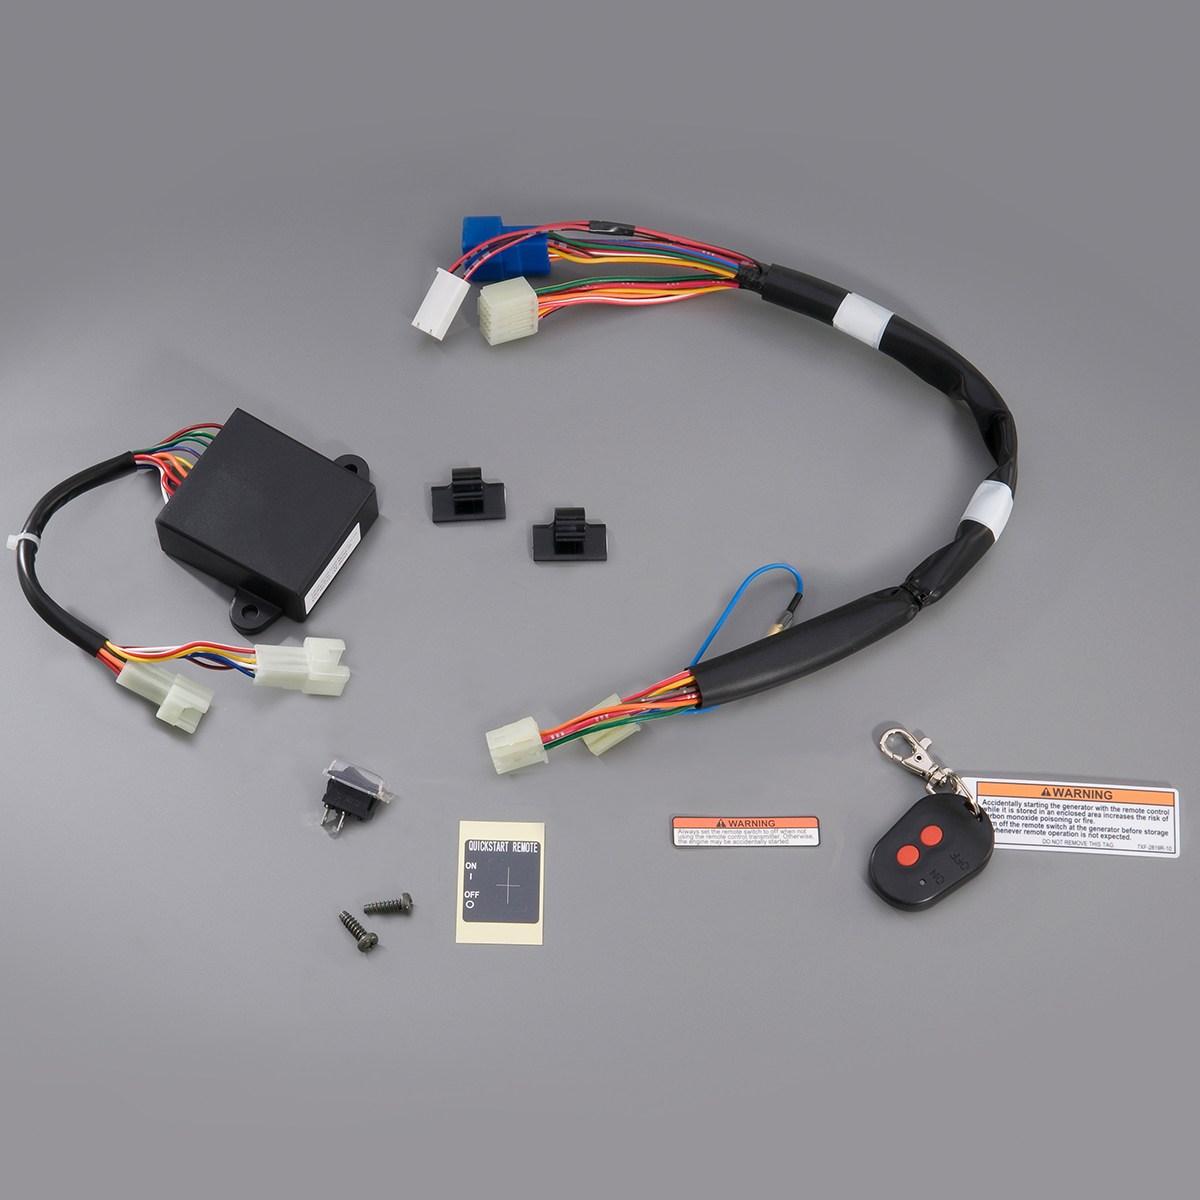 Yamaha EF4500i/EF6300i Remote Wireless Start Kit